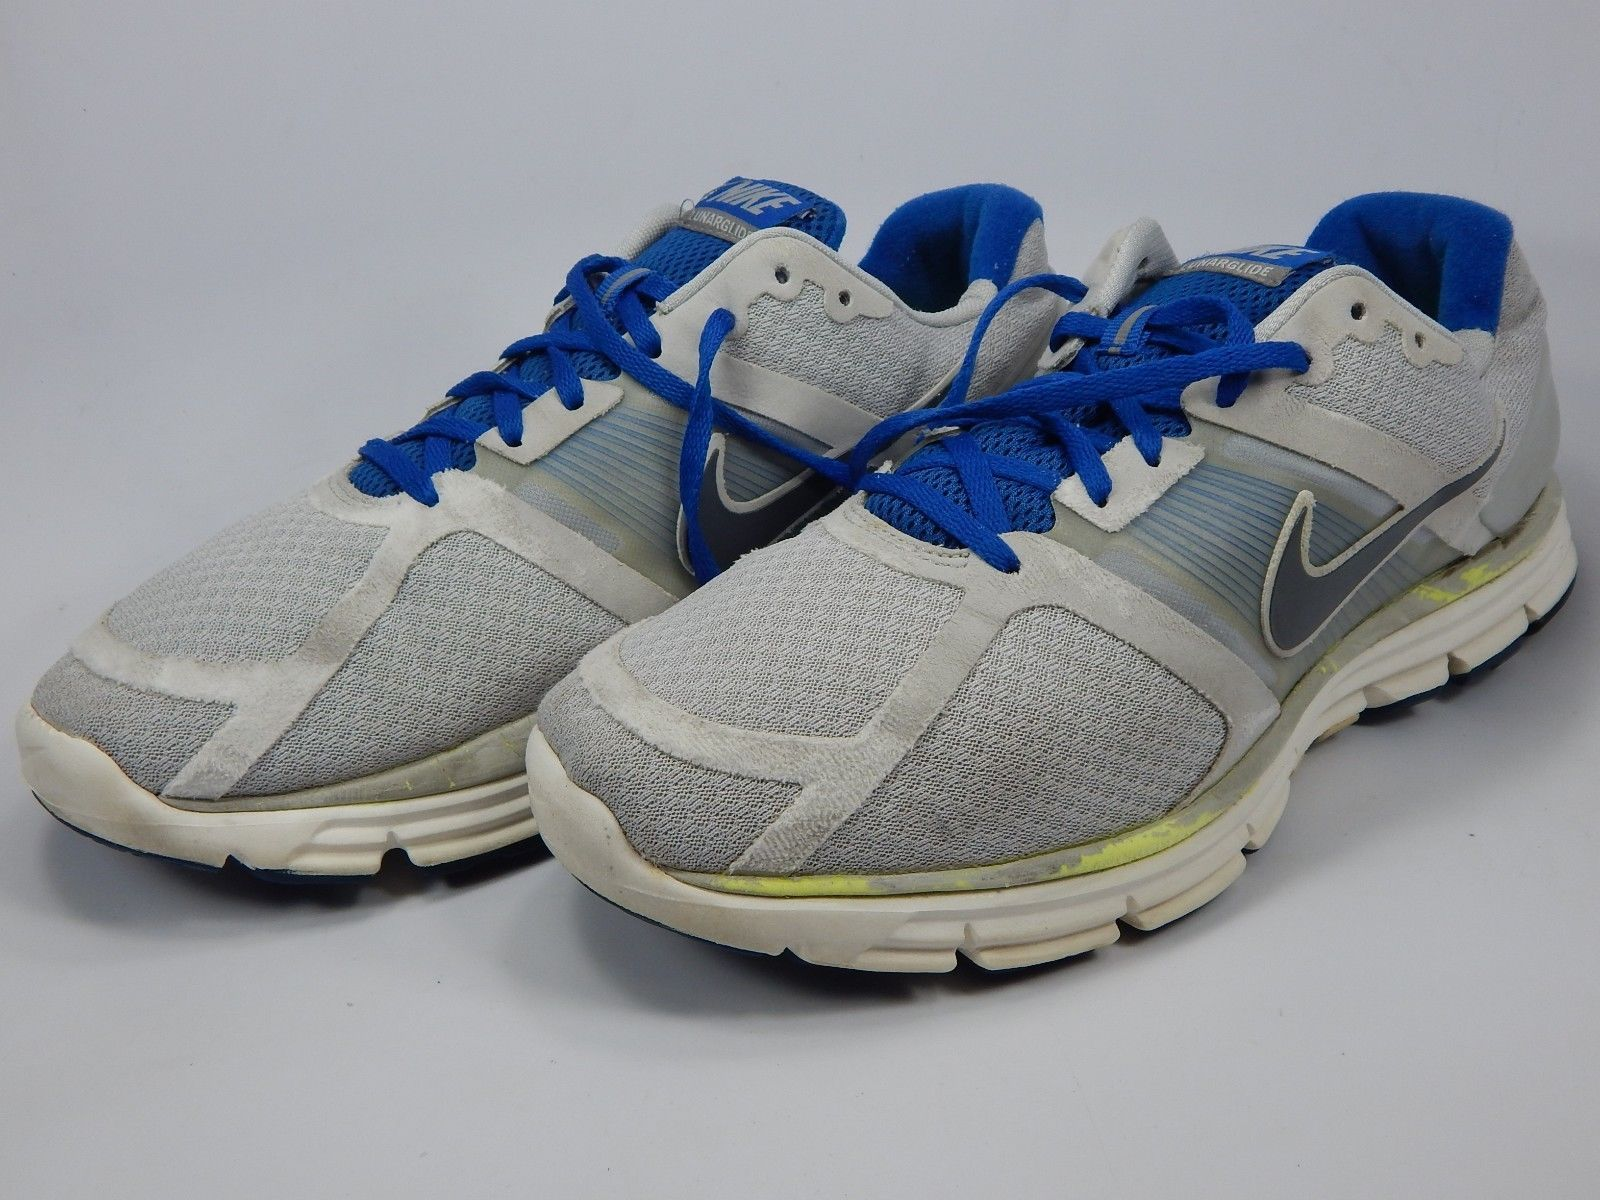 Nike Lunarglide+ Size 12 M (D) EU 46 Men's Running Shoes Gray Blue 366644-018